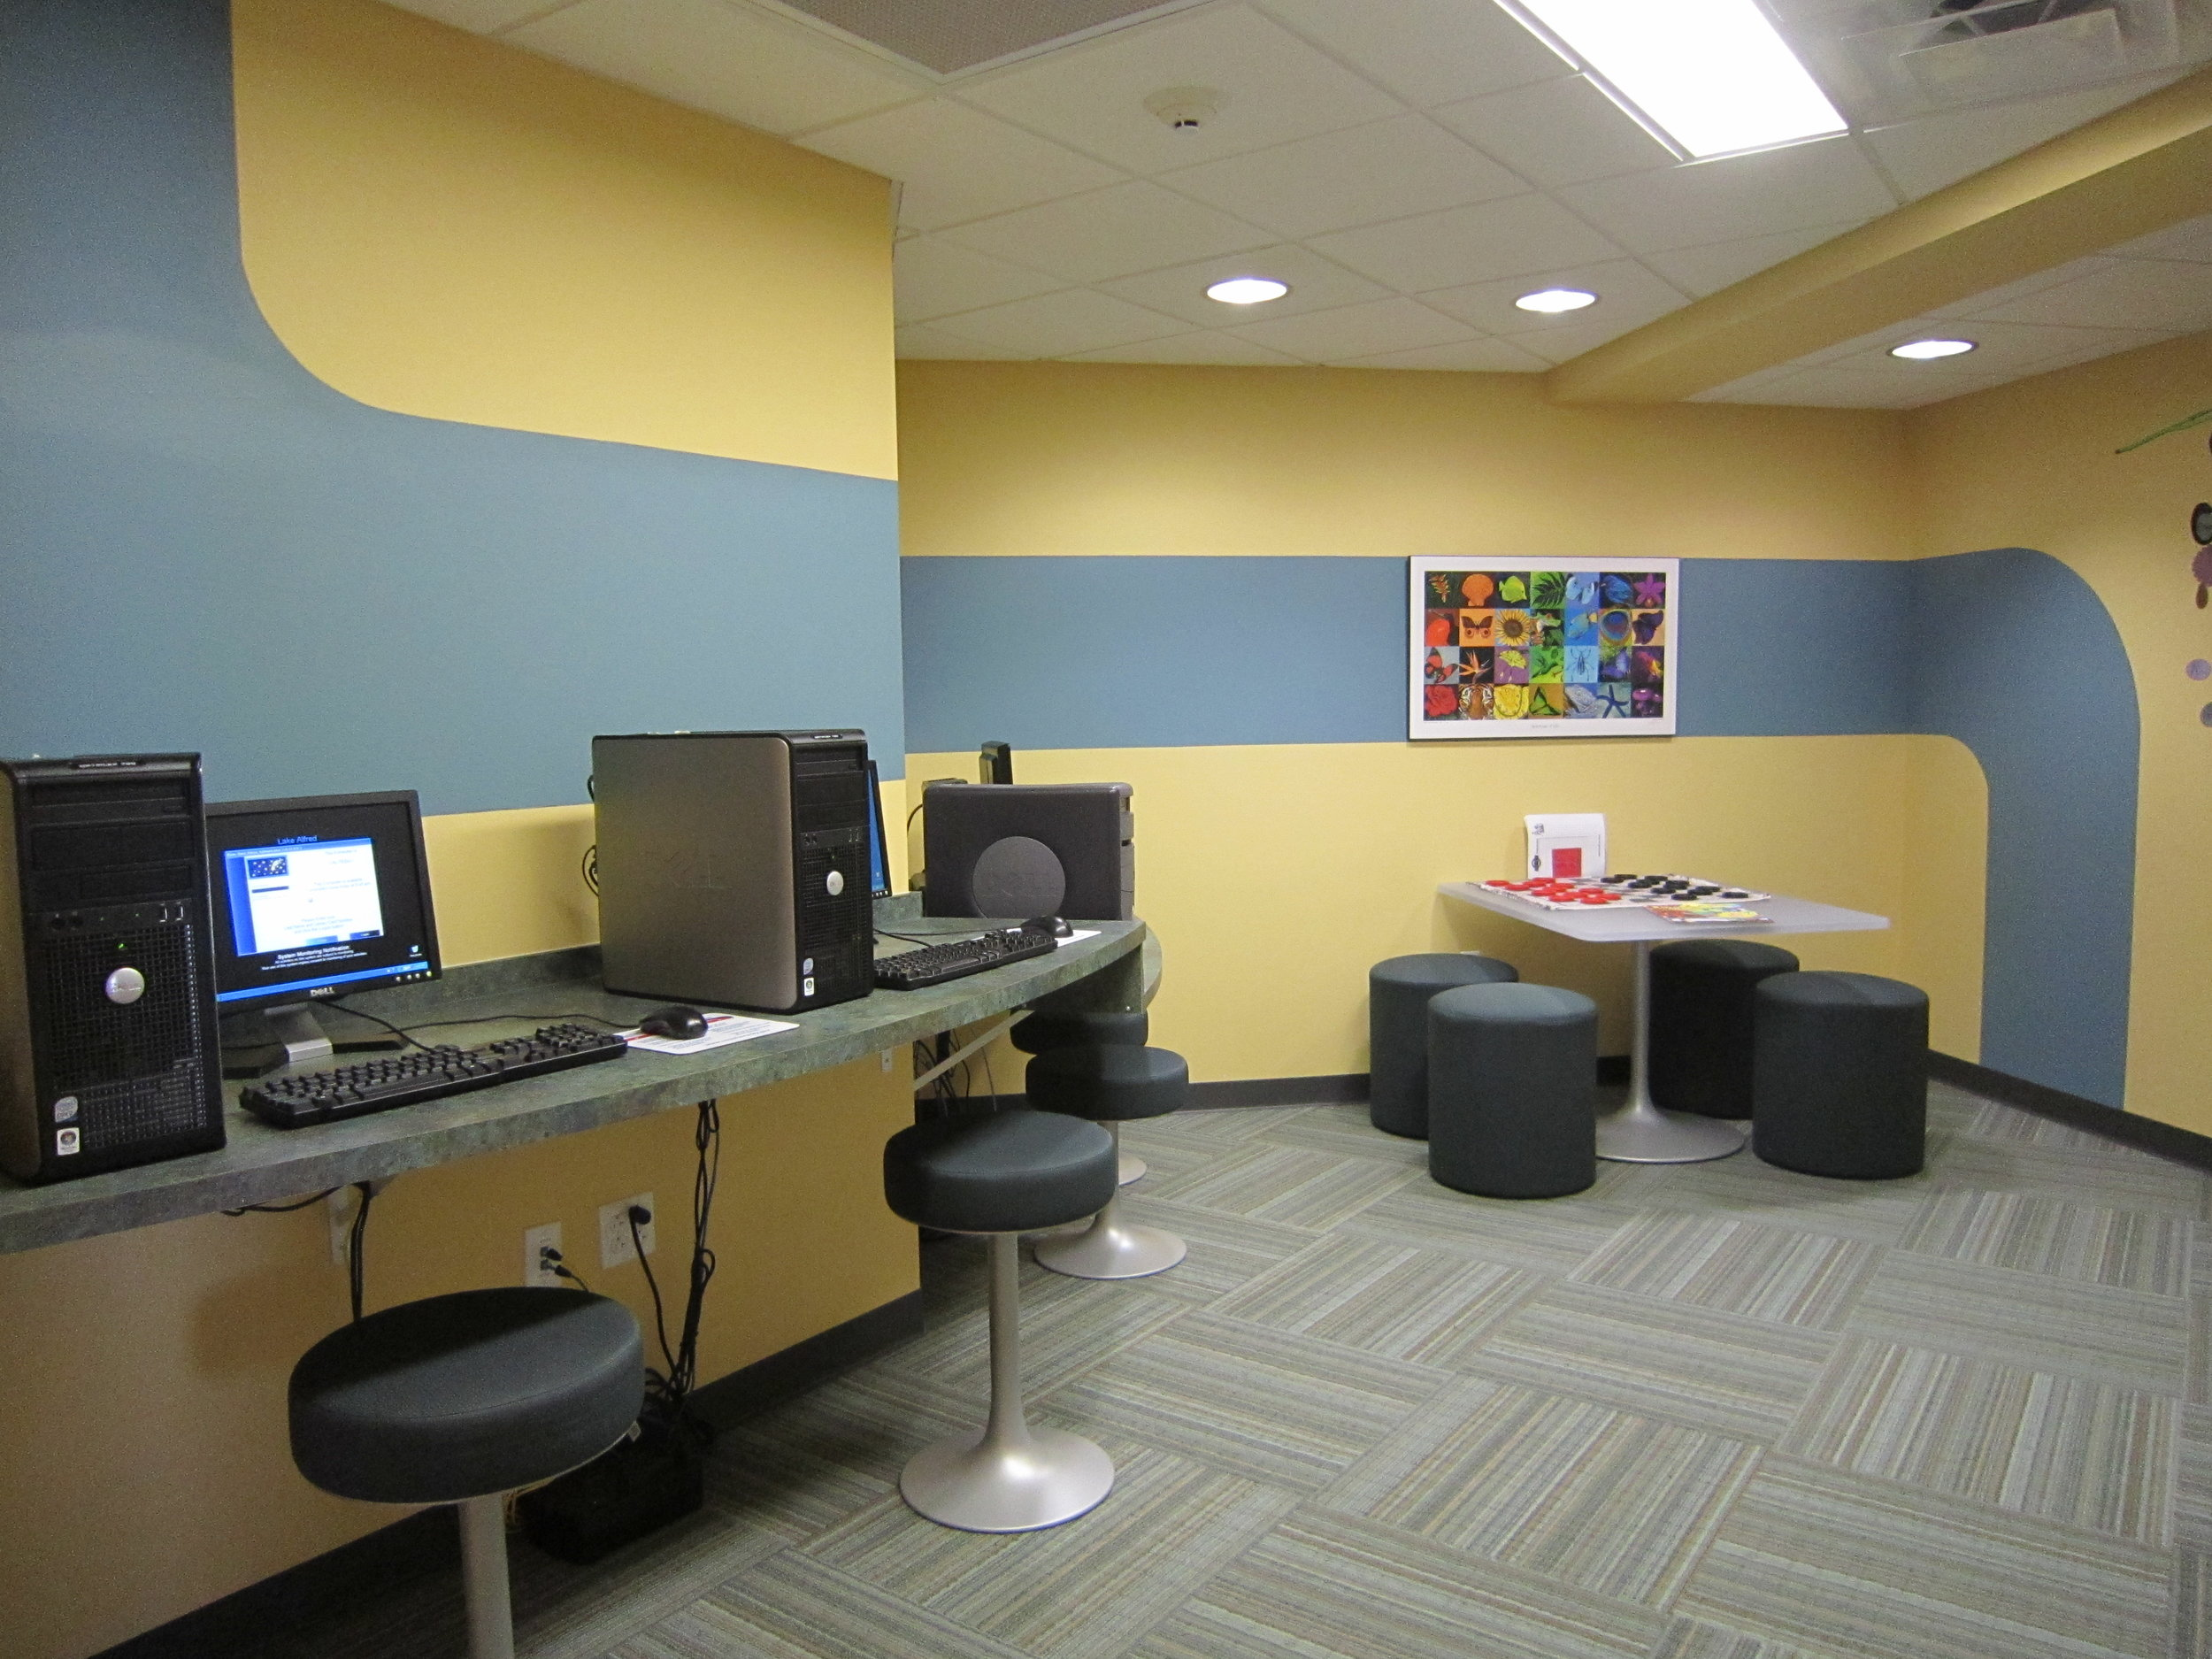 Lake Alfred Public Library - Lake Alfred, FL